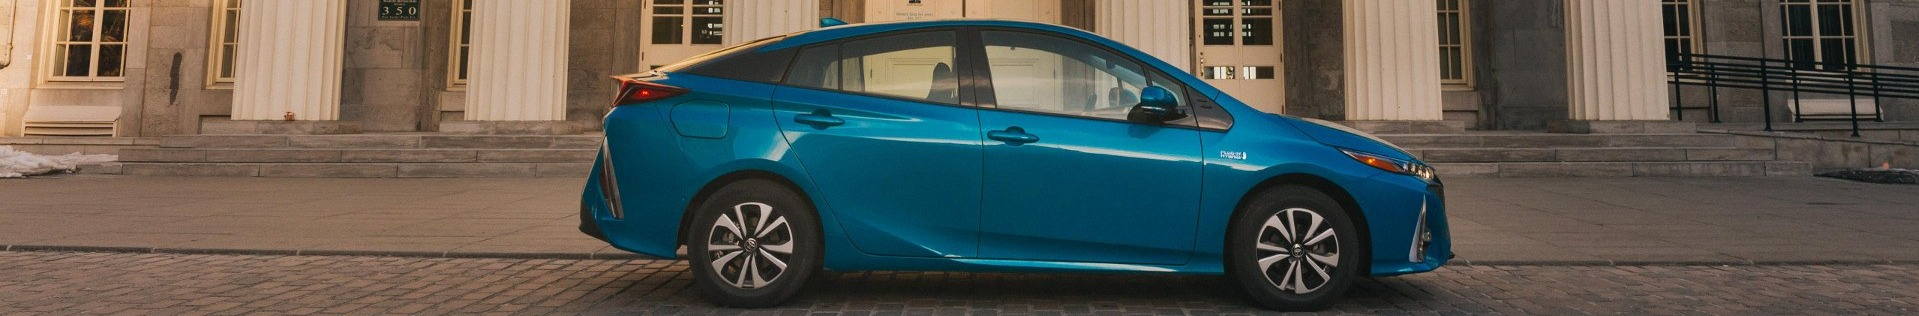 2018-Toyota-Prius-Prime-Plug-in-Electric-Hybrid-Toronto-Feature-2